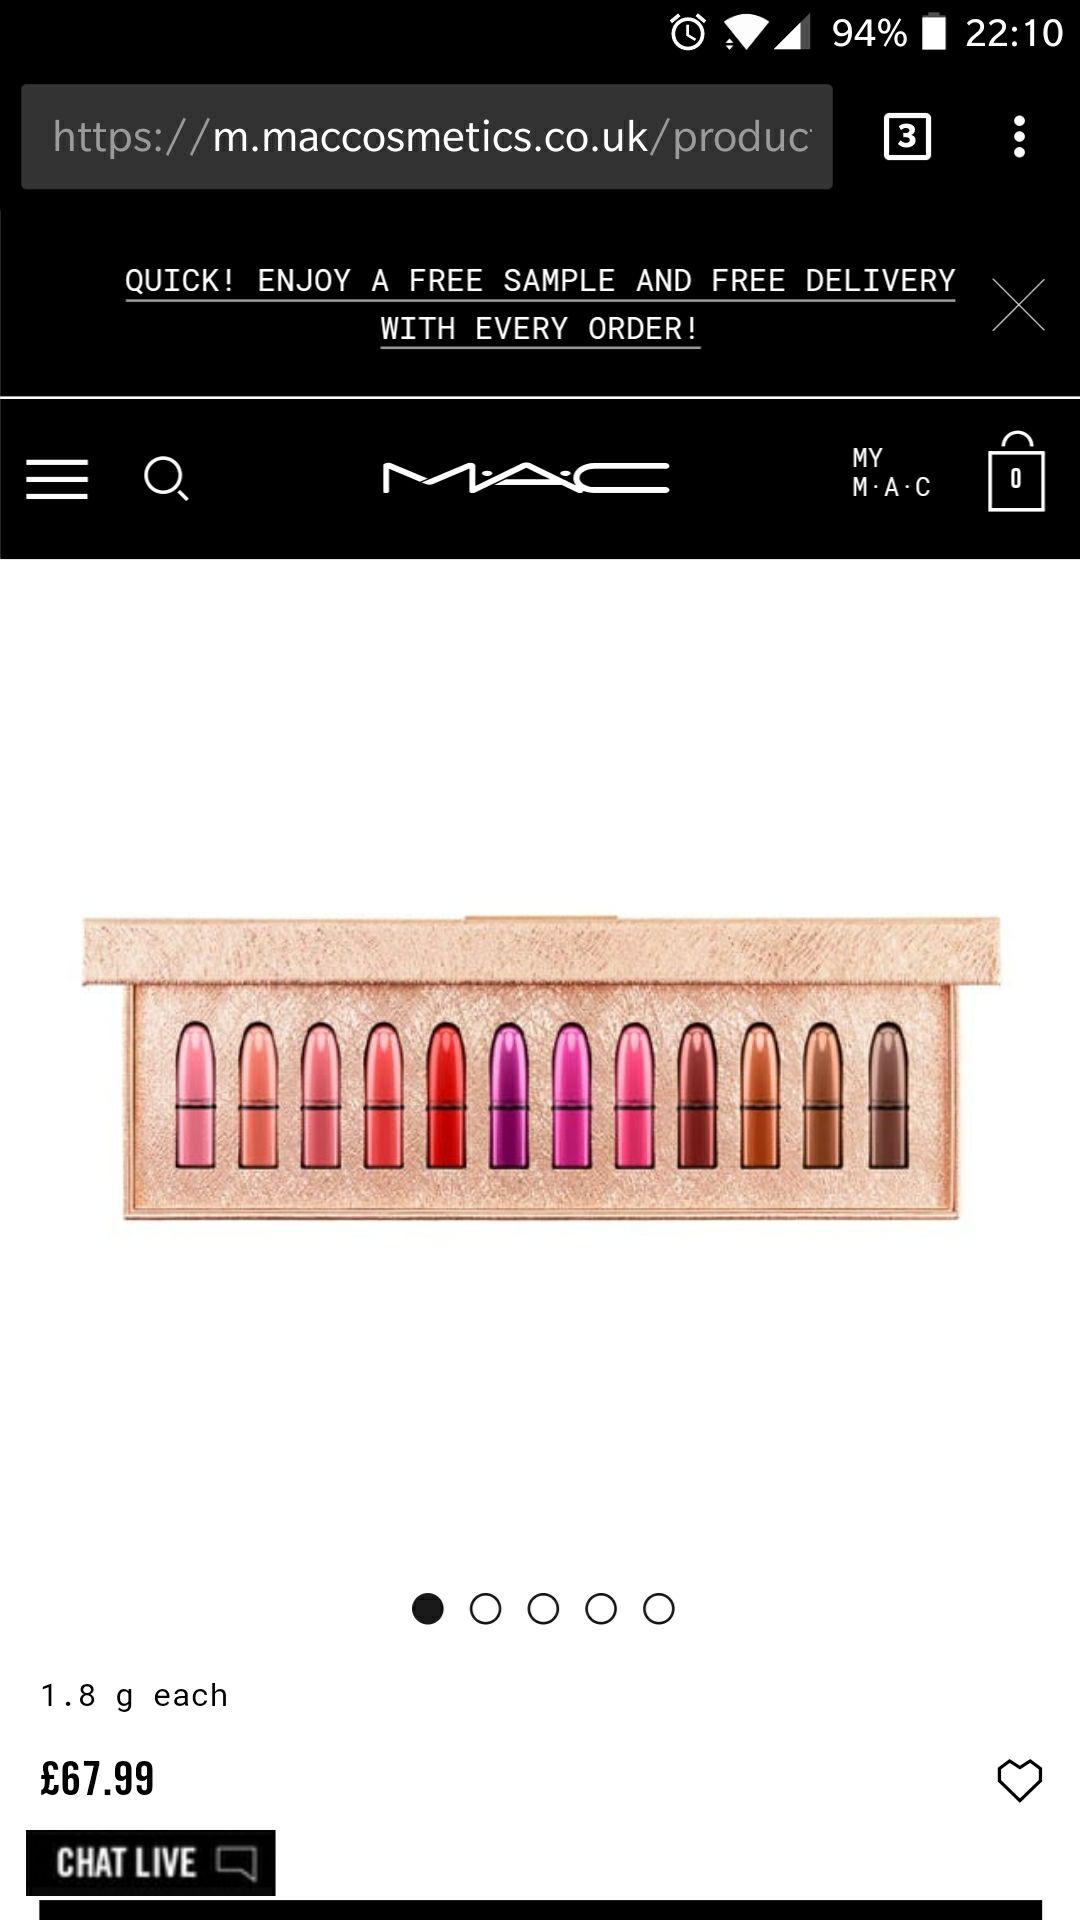 MAC - Snow Ball mini lipsticks (12 x 1.8g) - Was £85, now £67.99